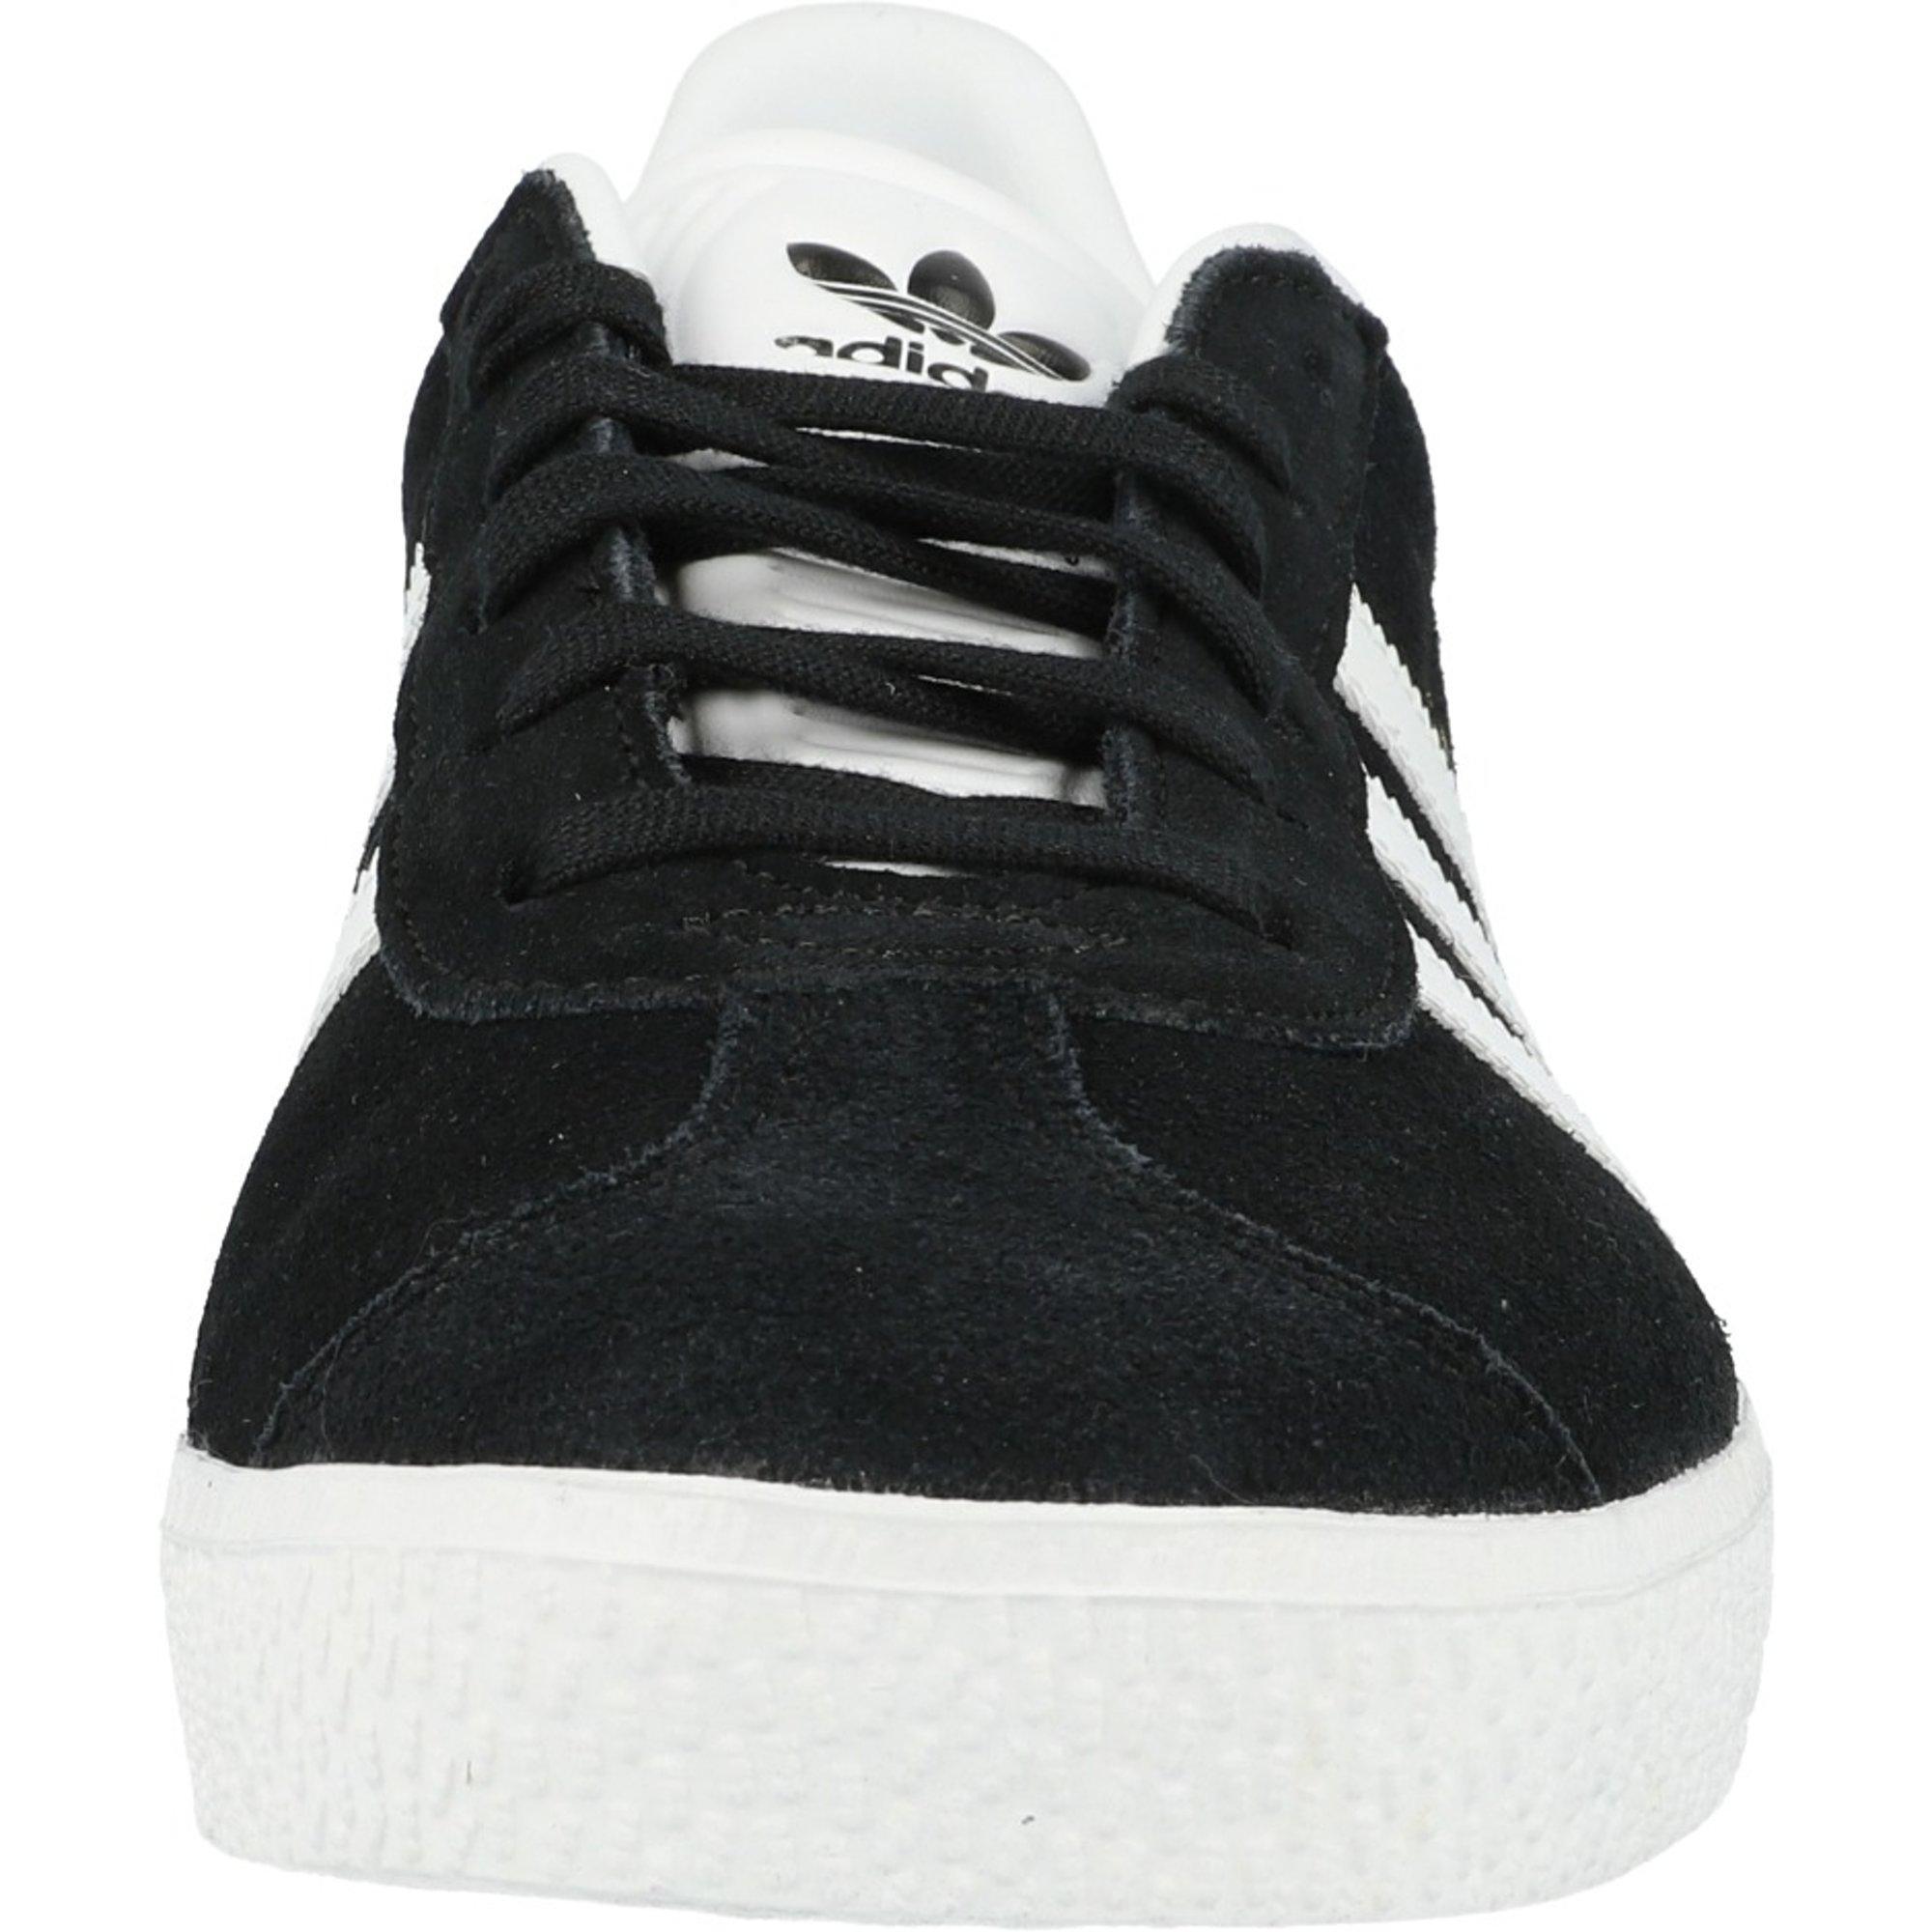 adidas Originals Gazelle J Black/Gold Metallic/White Suede Junior